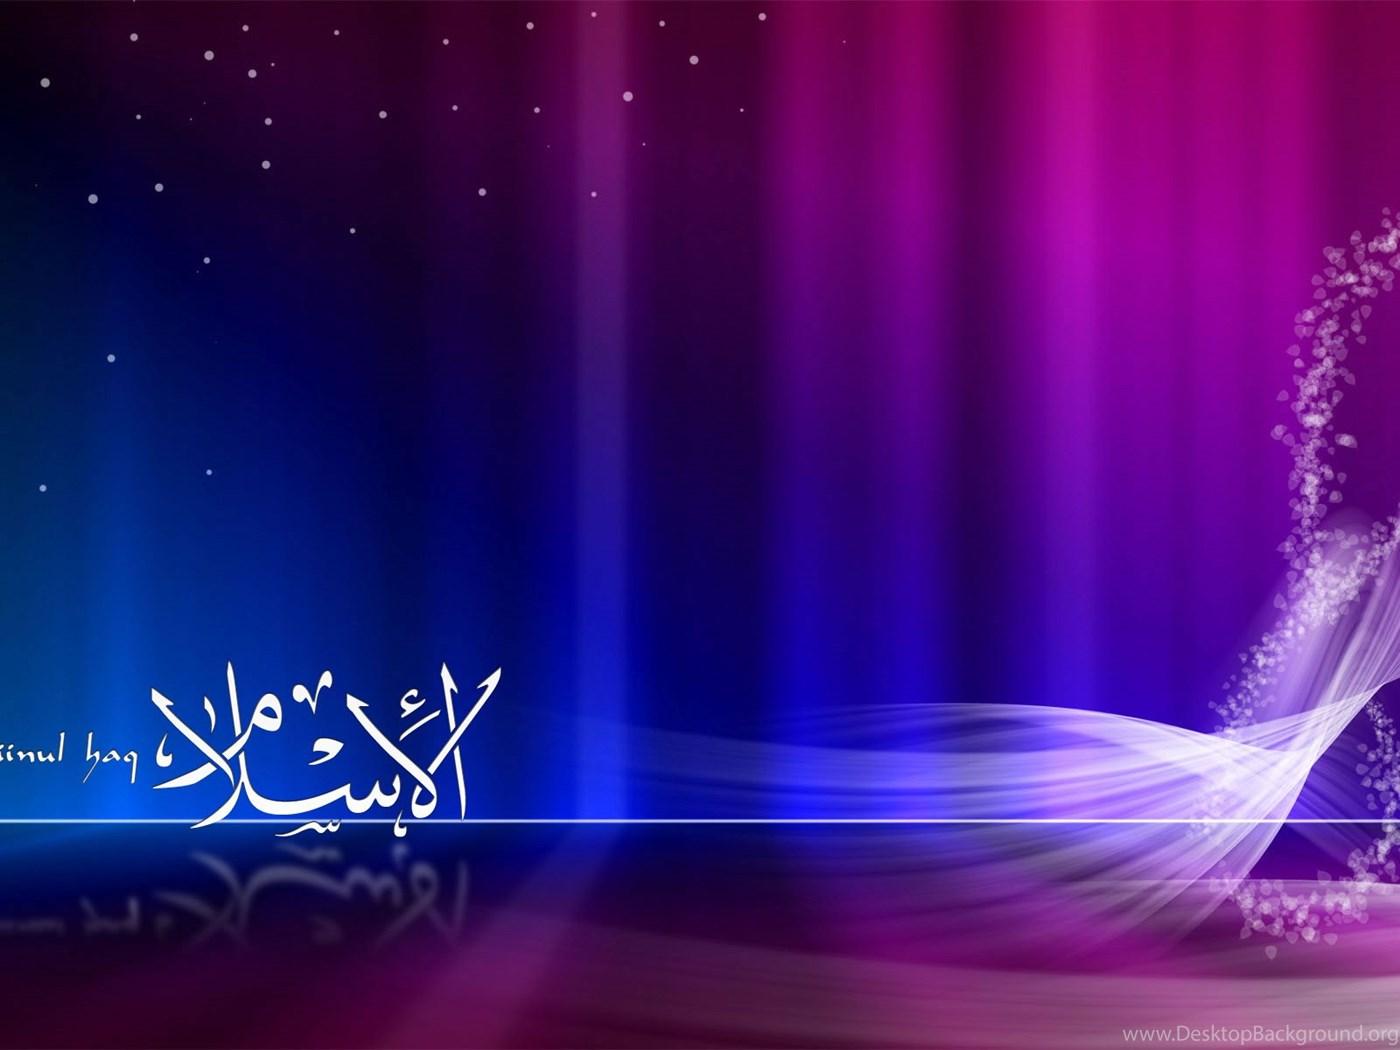 Fonds D Ecran Islam Tous Les Wallpapers Islam Desktop Background